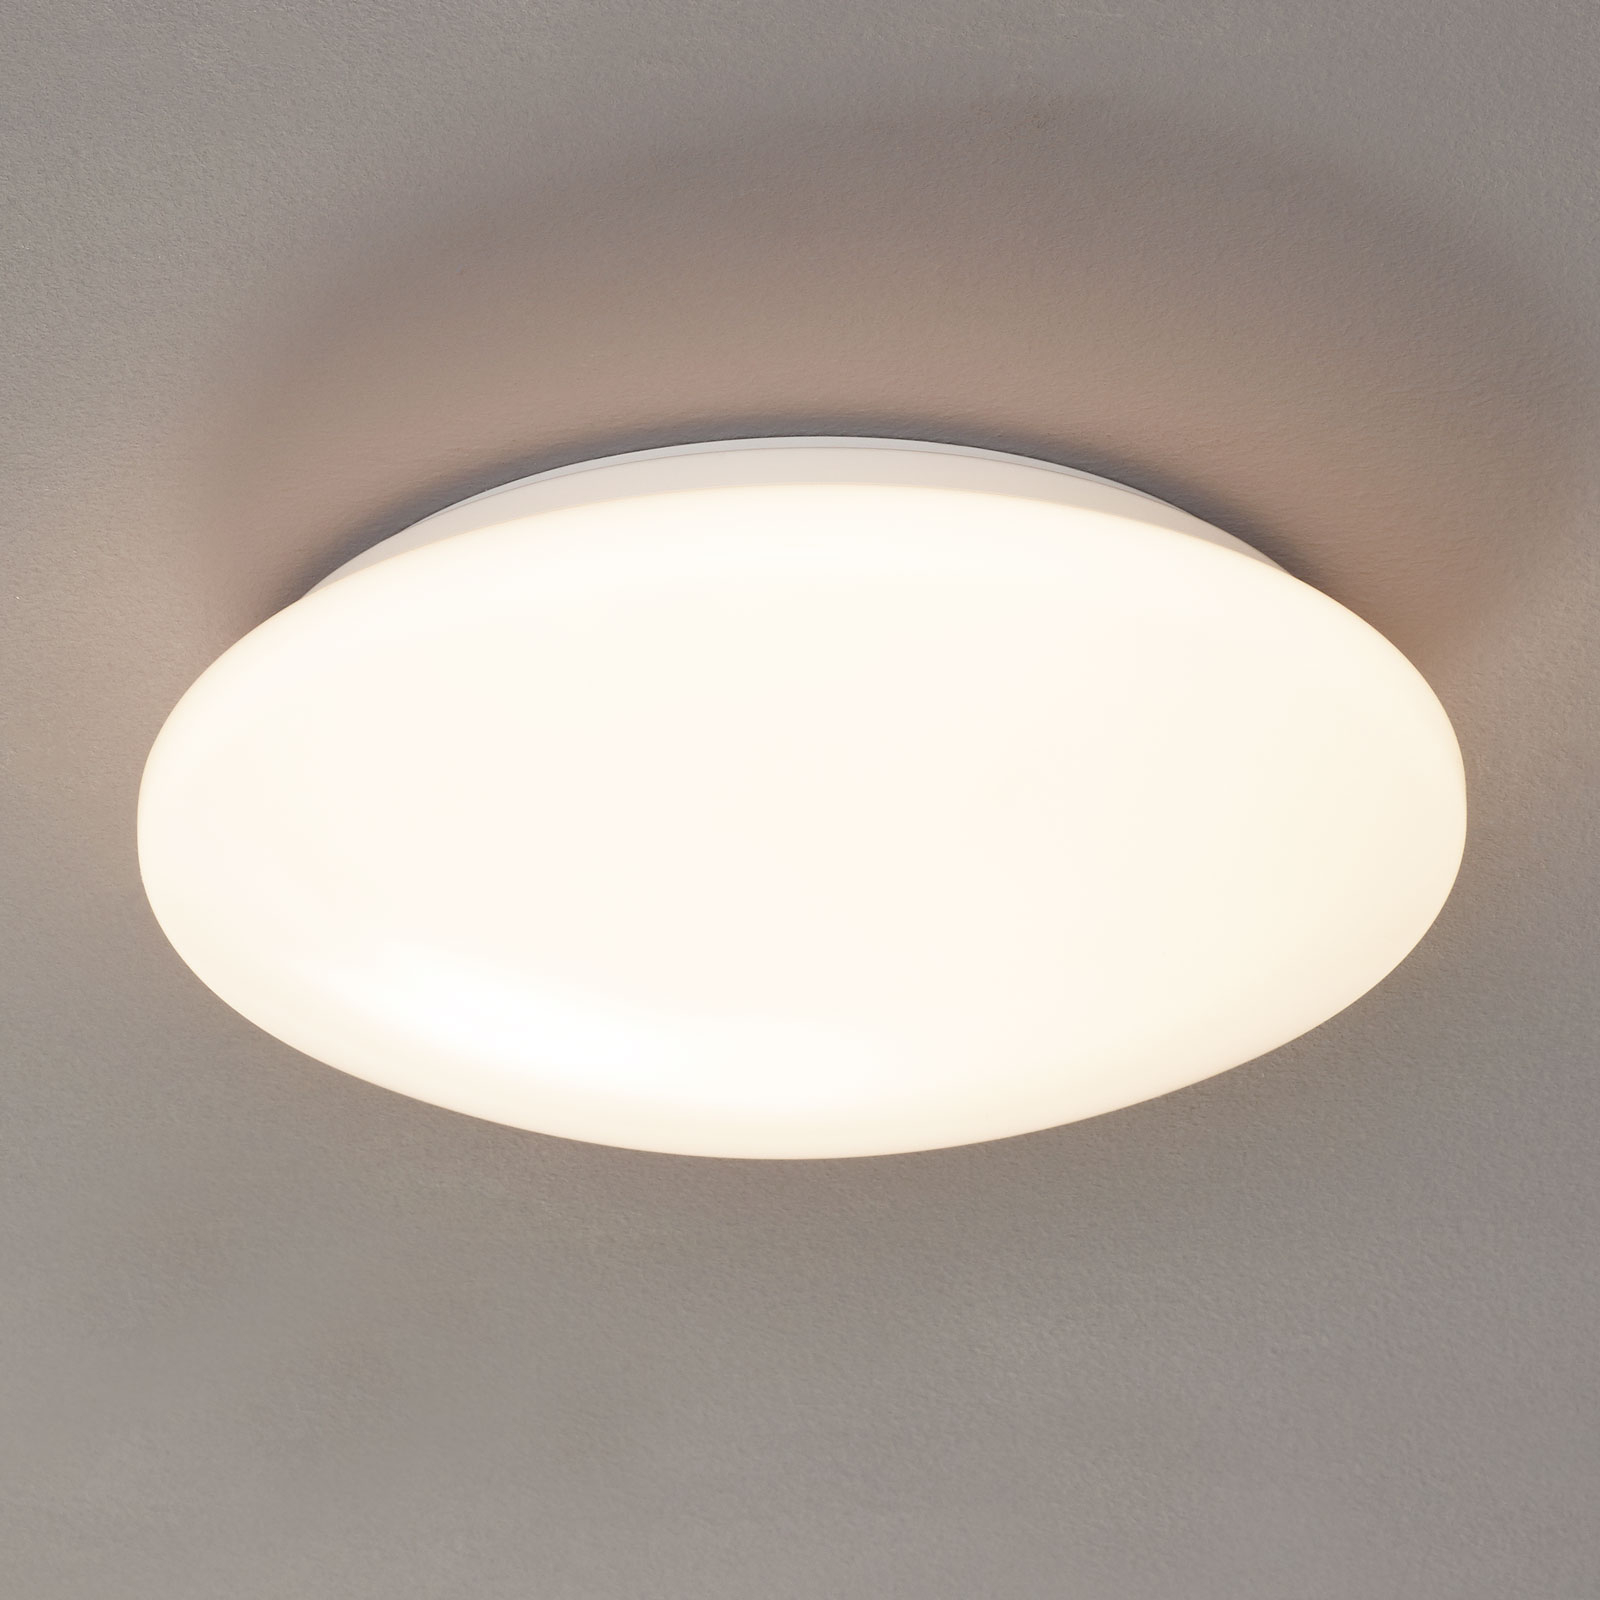 LED-taklampe Pollux, bevegelsessensor, Ø 27 cm